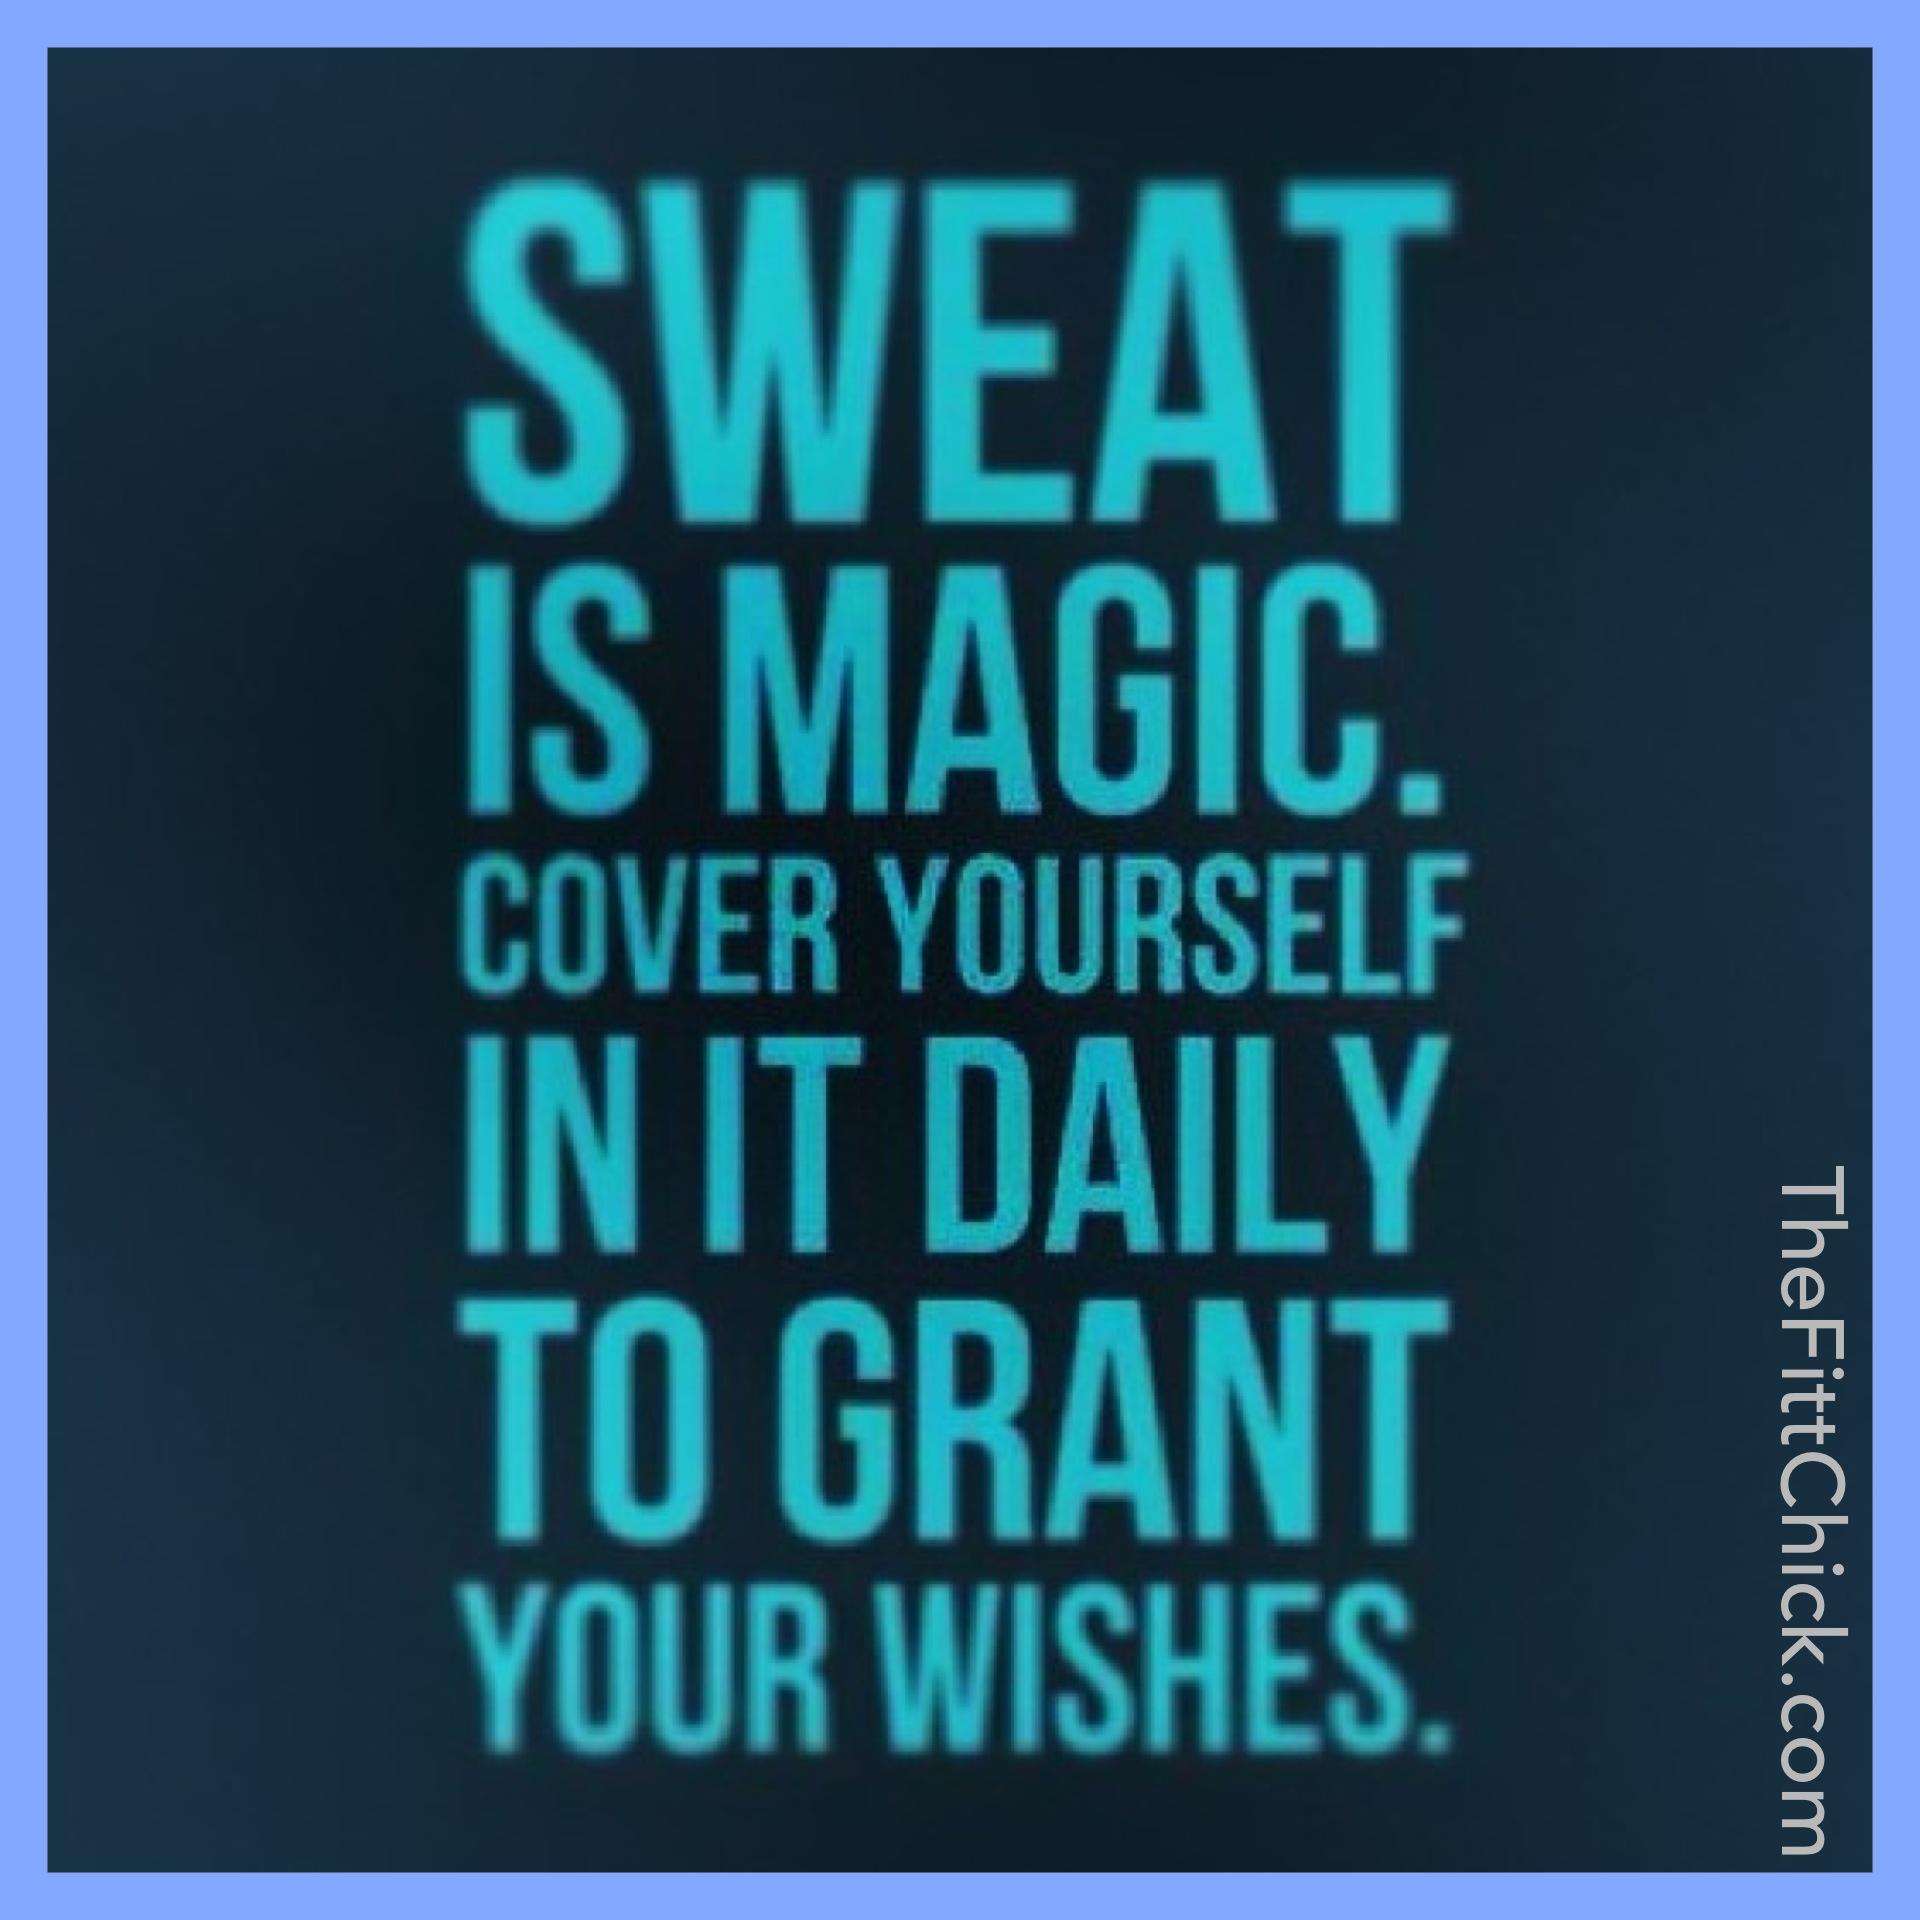 Get Sweaty Saturday From Thefittchick Thefittchick